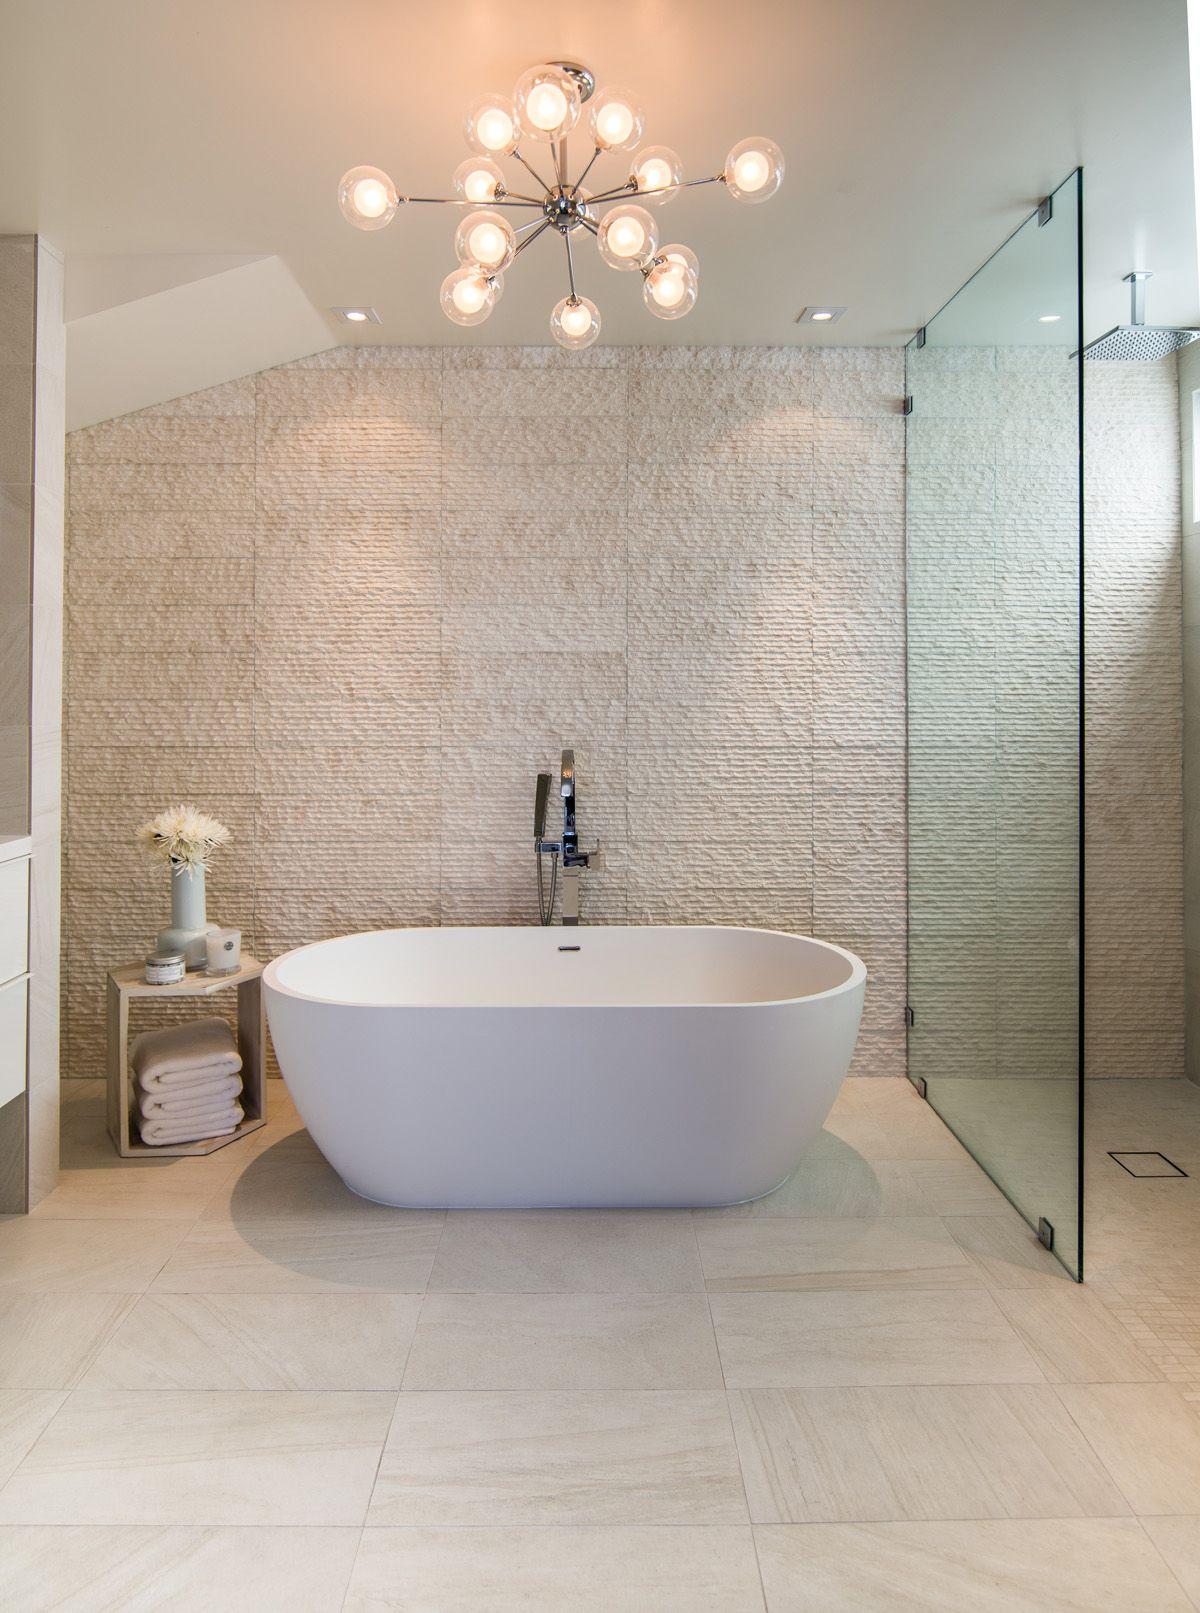 Adm Bathroom Design on apt bathroom design, ada bathroom design, cat bathroom design, man bathroom design, apa bathroom design,